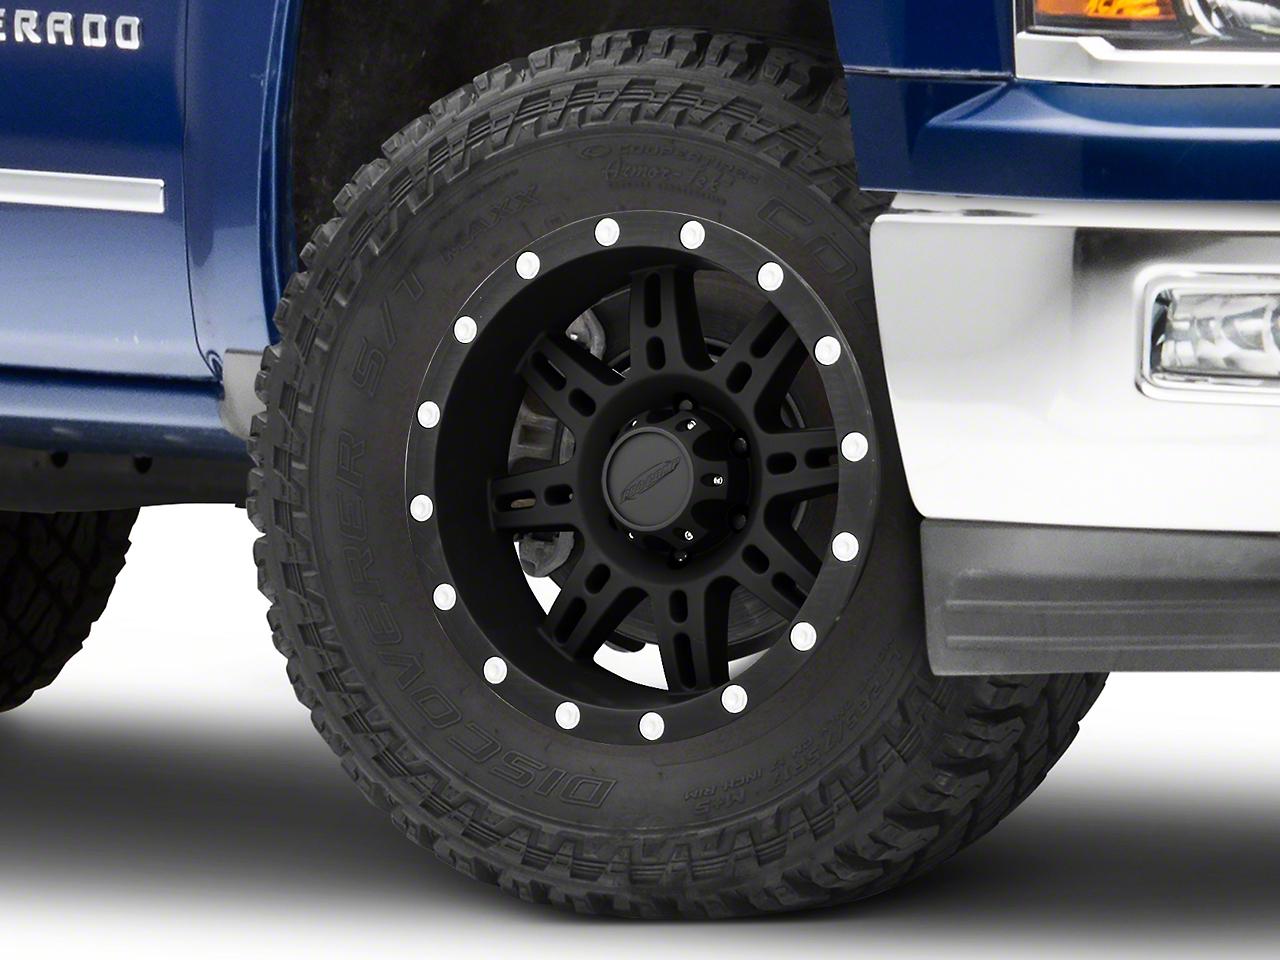 Pro Comp Series 7031 Matte Black 6-Lug Wheel - 18x9 (99-18 Silverado 1500)